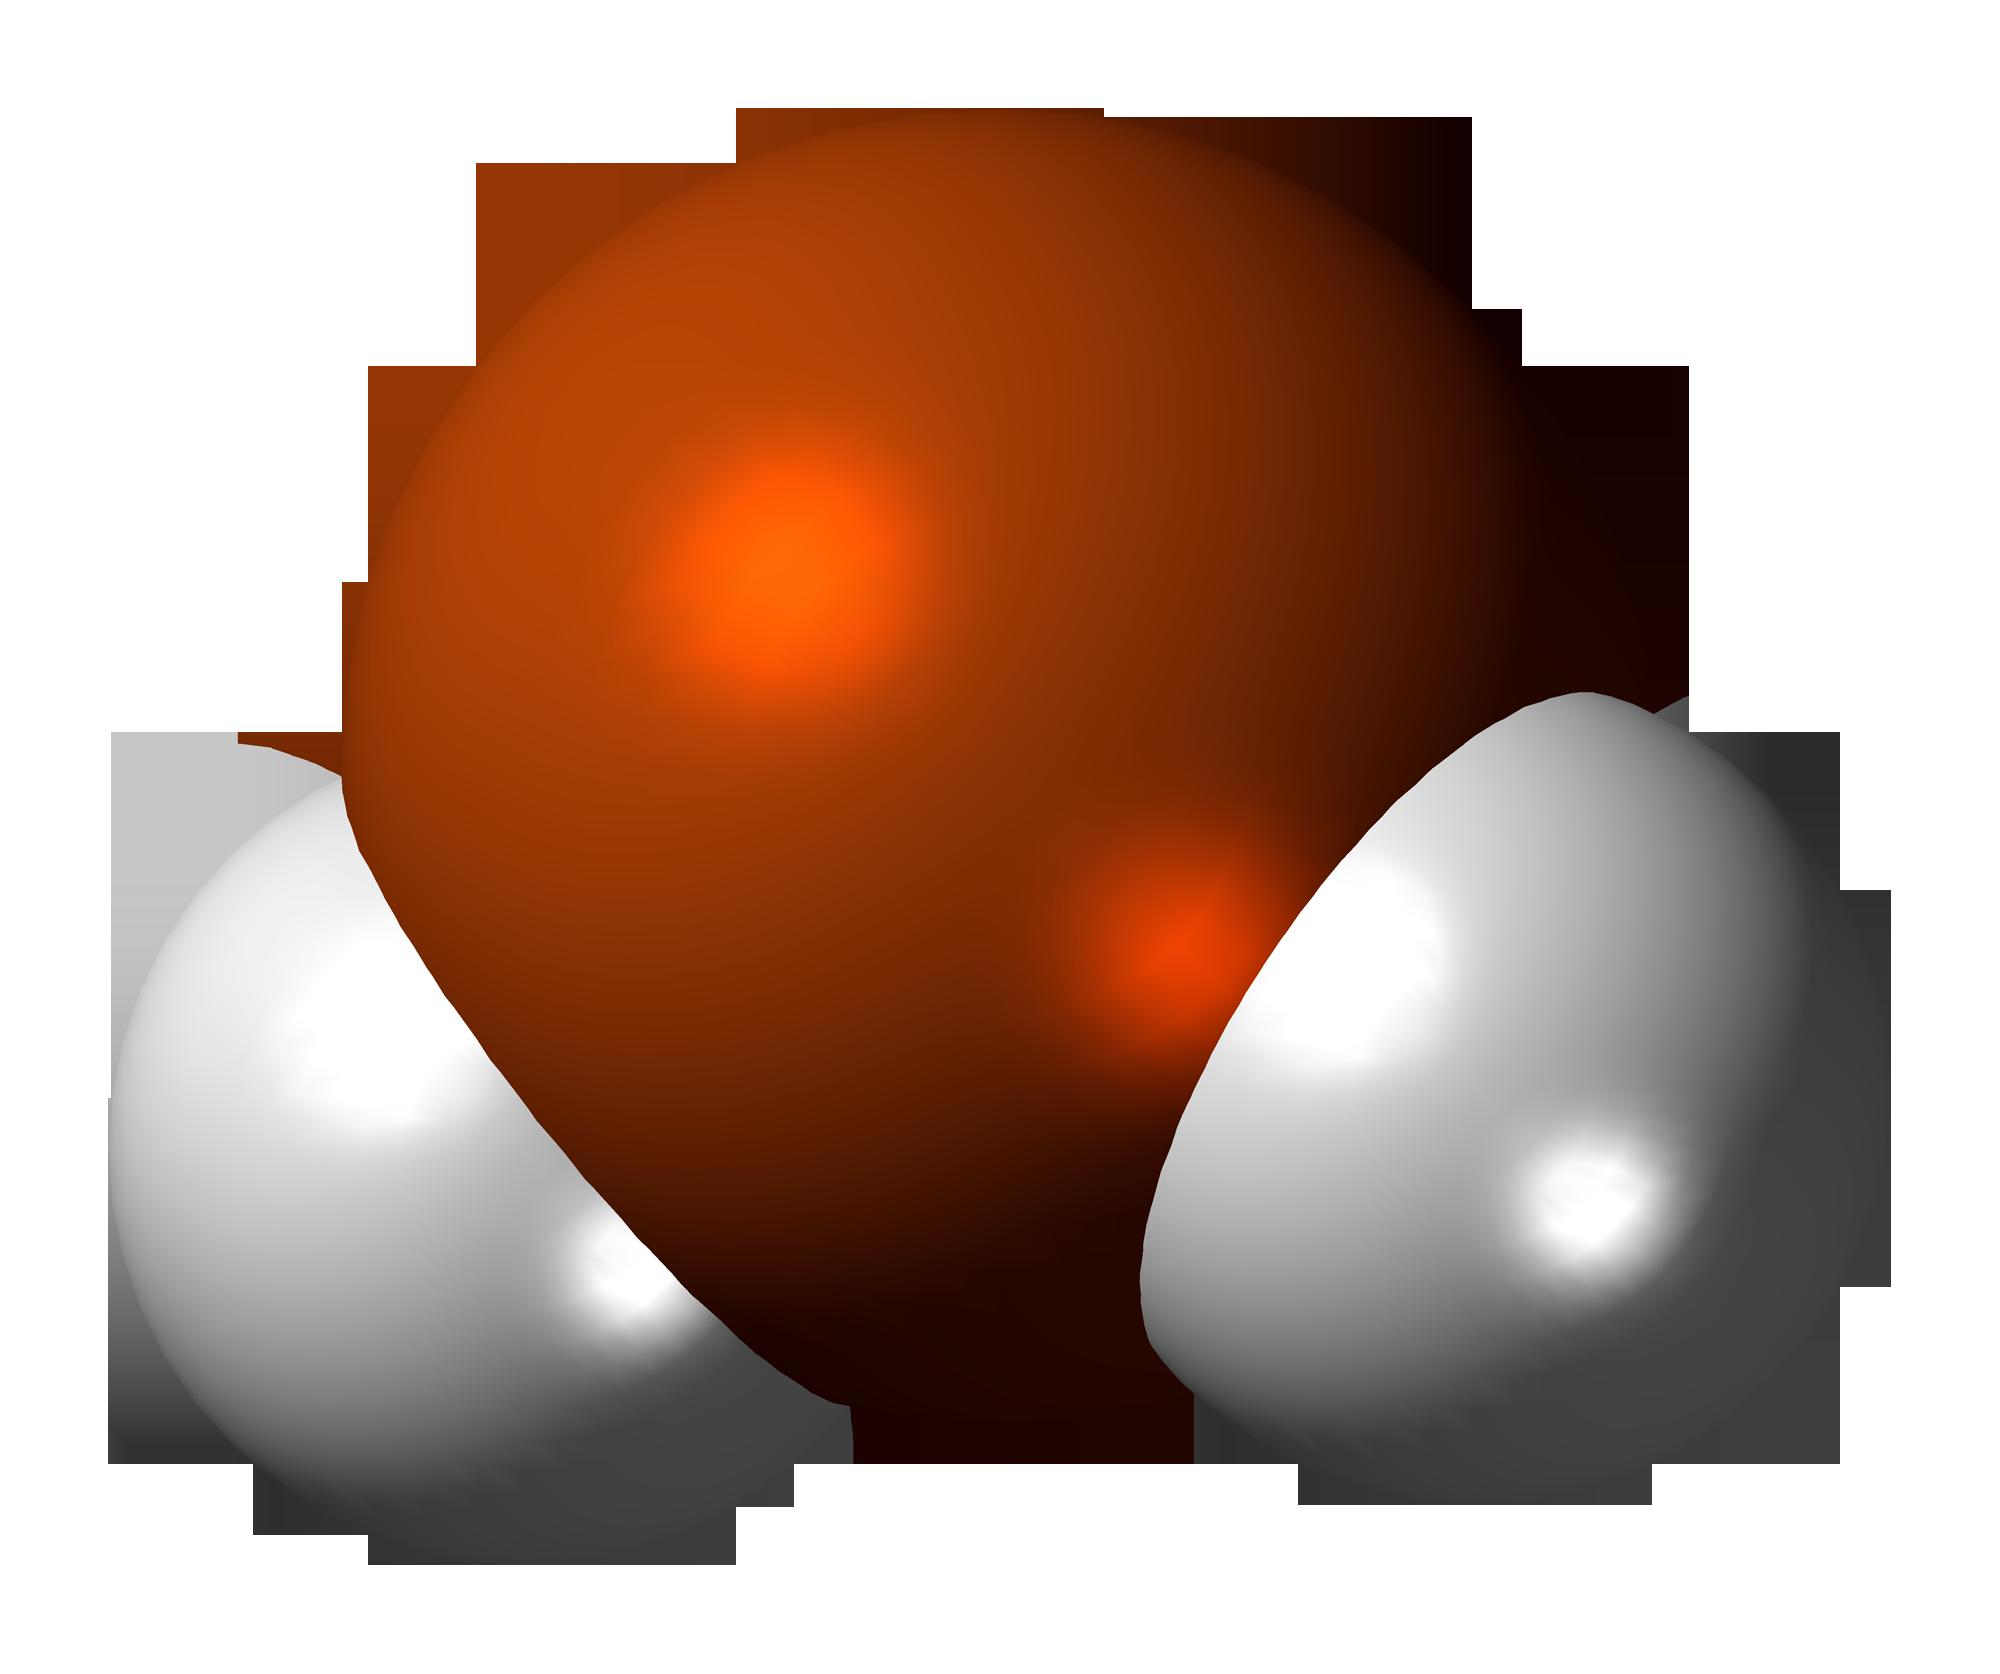 Atome hydrogene mobilité verte